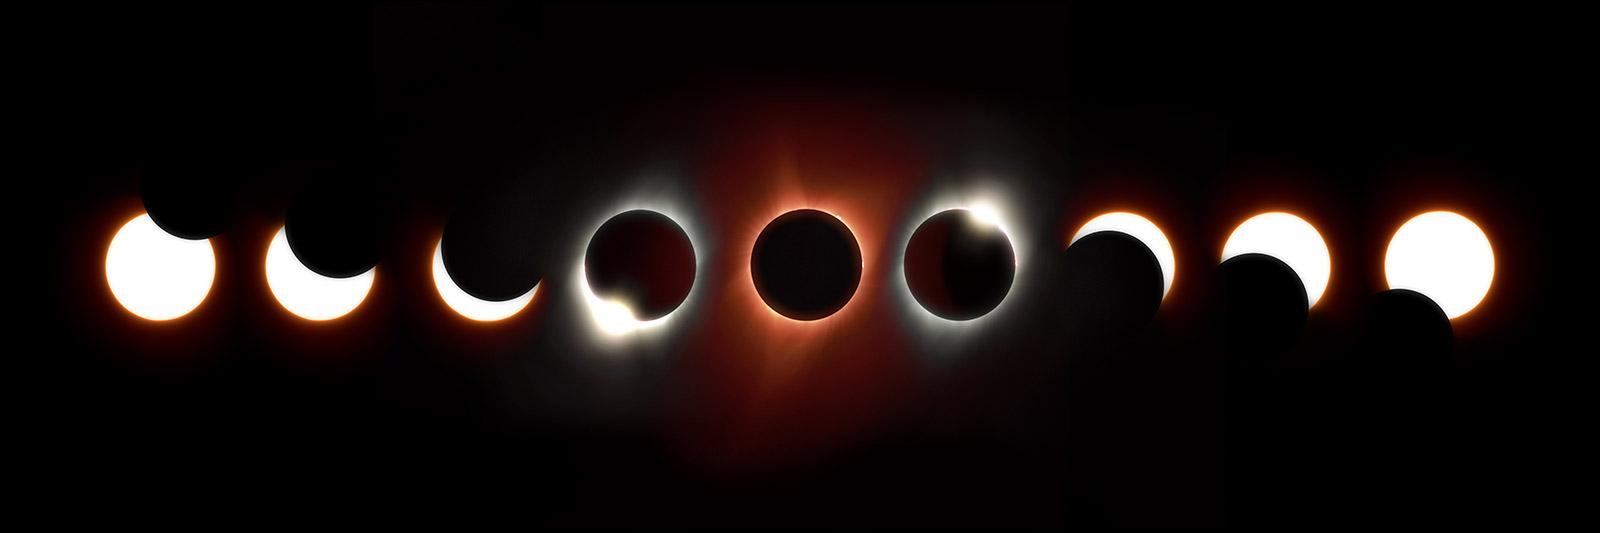 Eclipse Composite.  Purchase